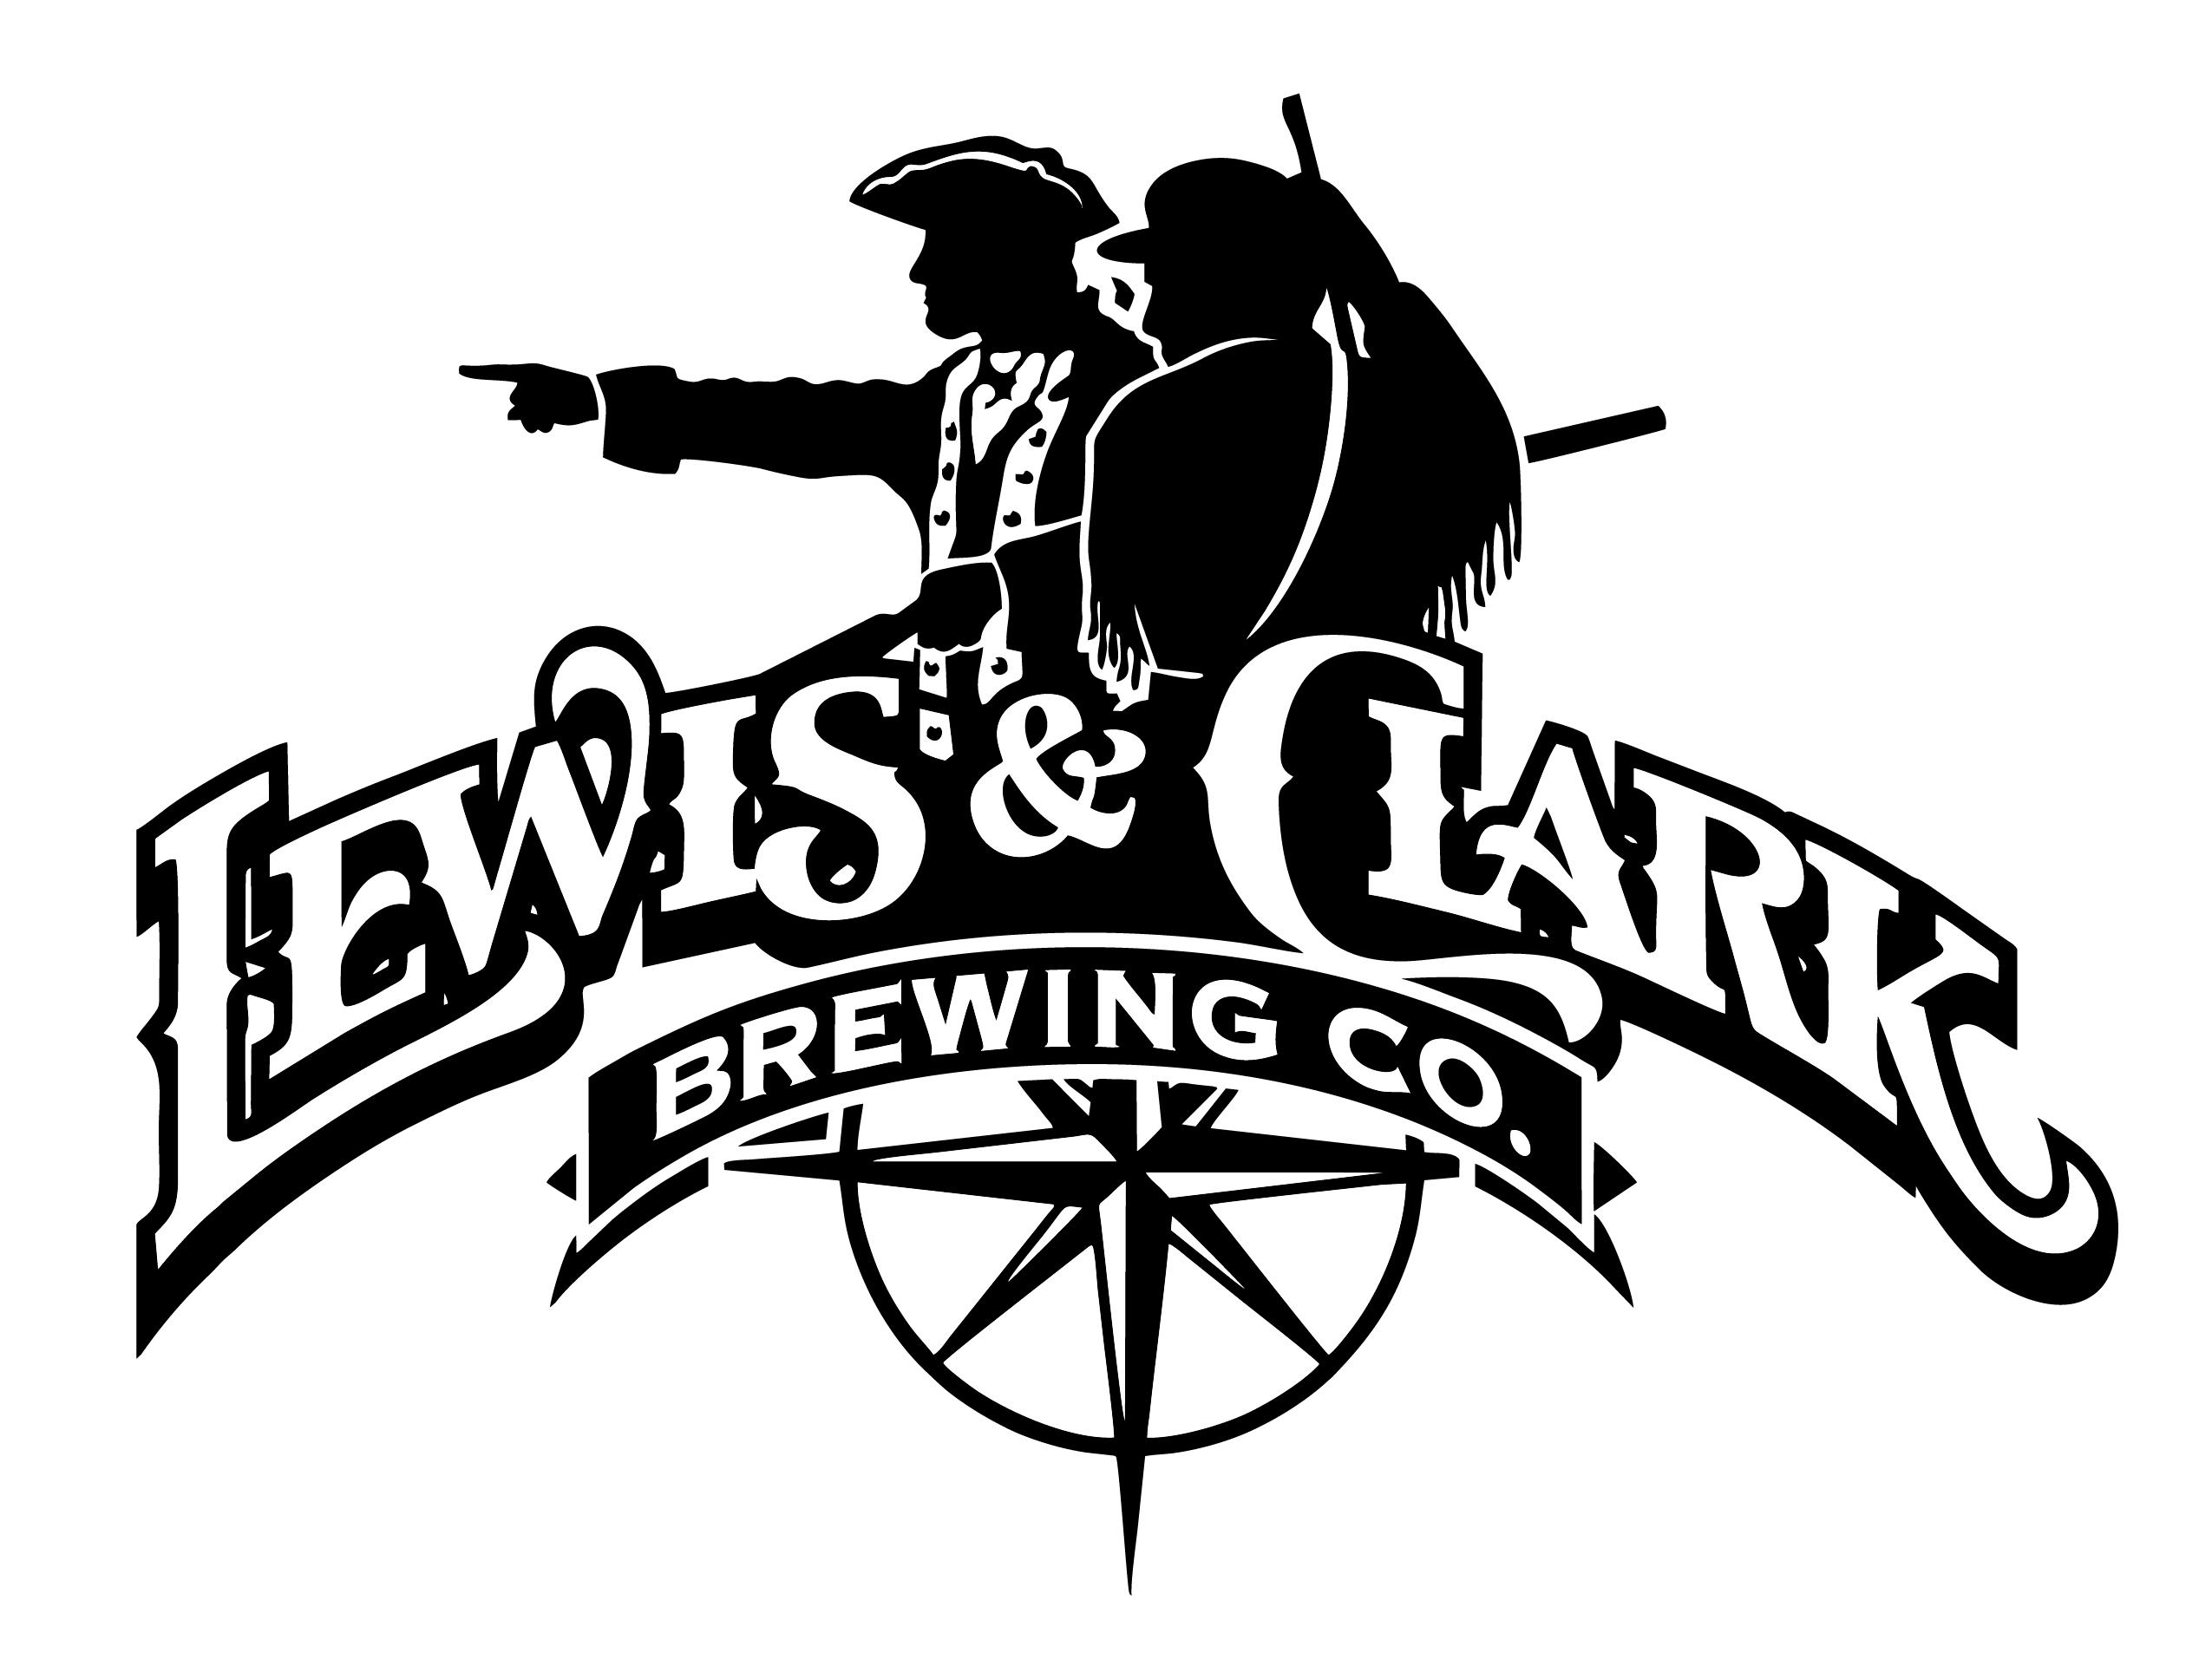 Lewis & Clark Brewing Co.